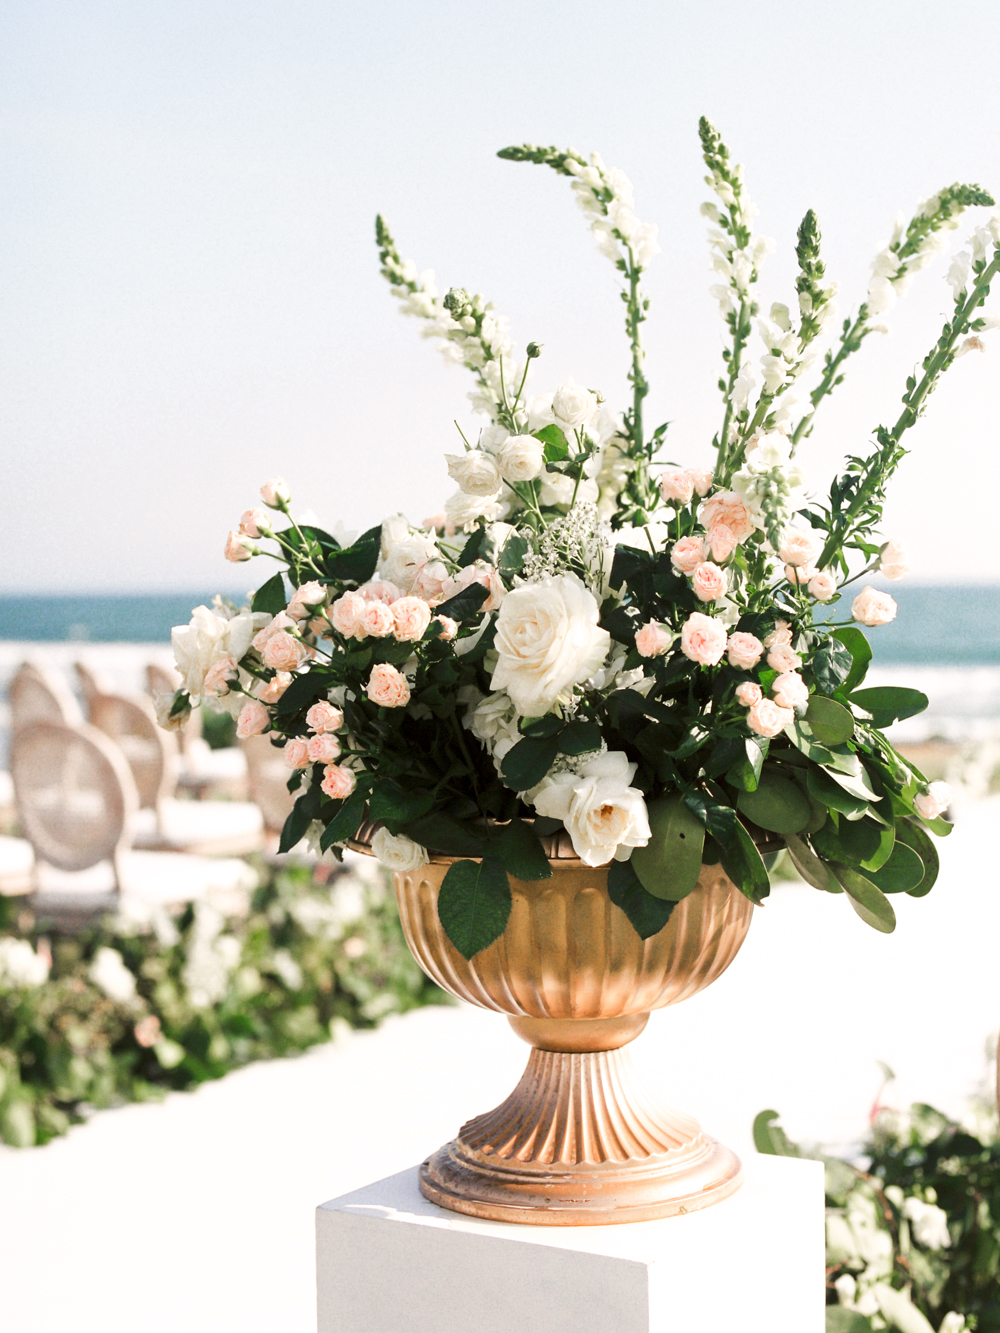 Bali_Real_Wedding_(c)_Rory_Wylie-61.jpg